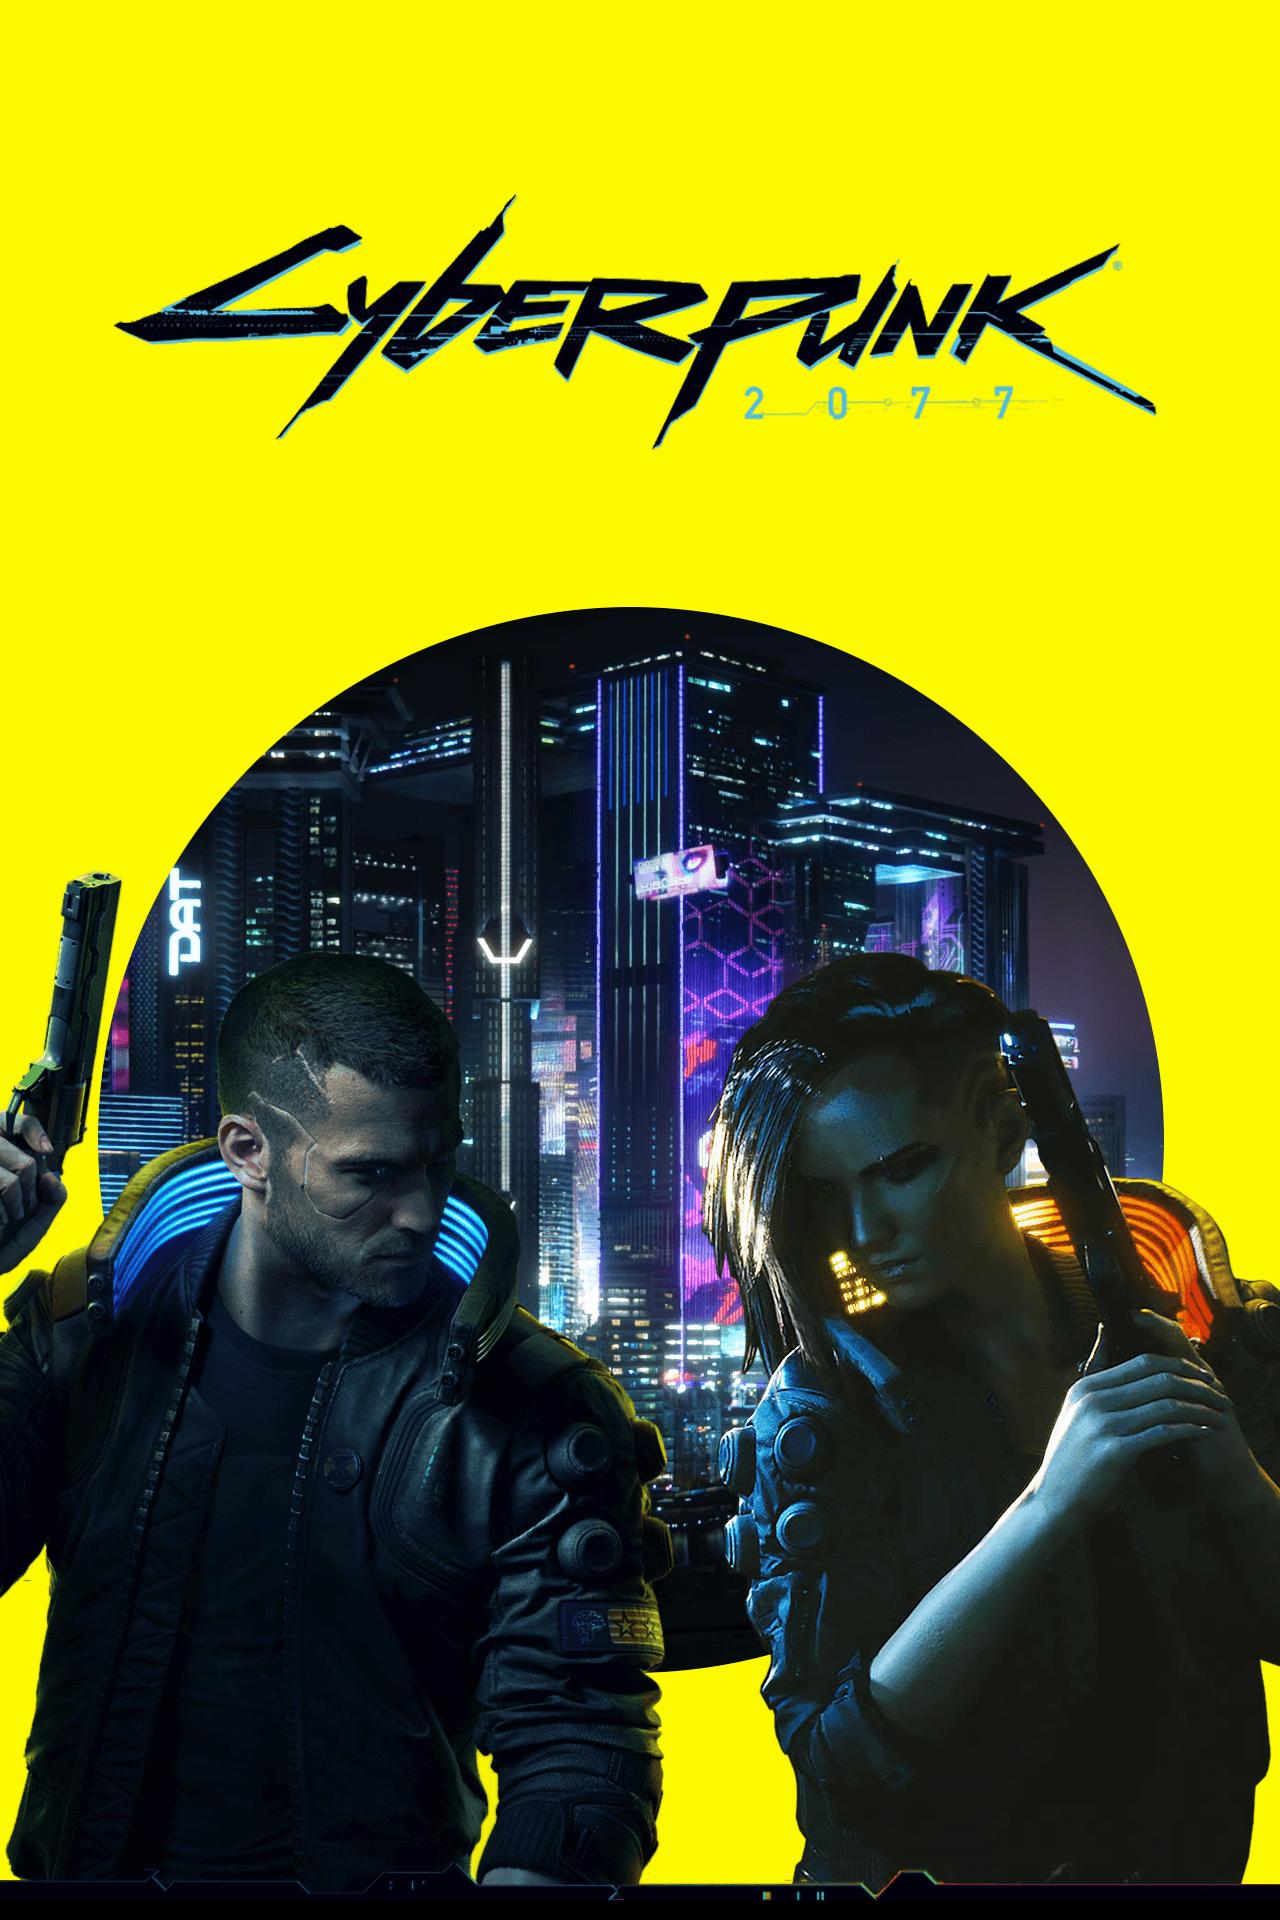 Cyberpunk 2077 Mobile Wallpapers - Wallpaper Cave